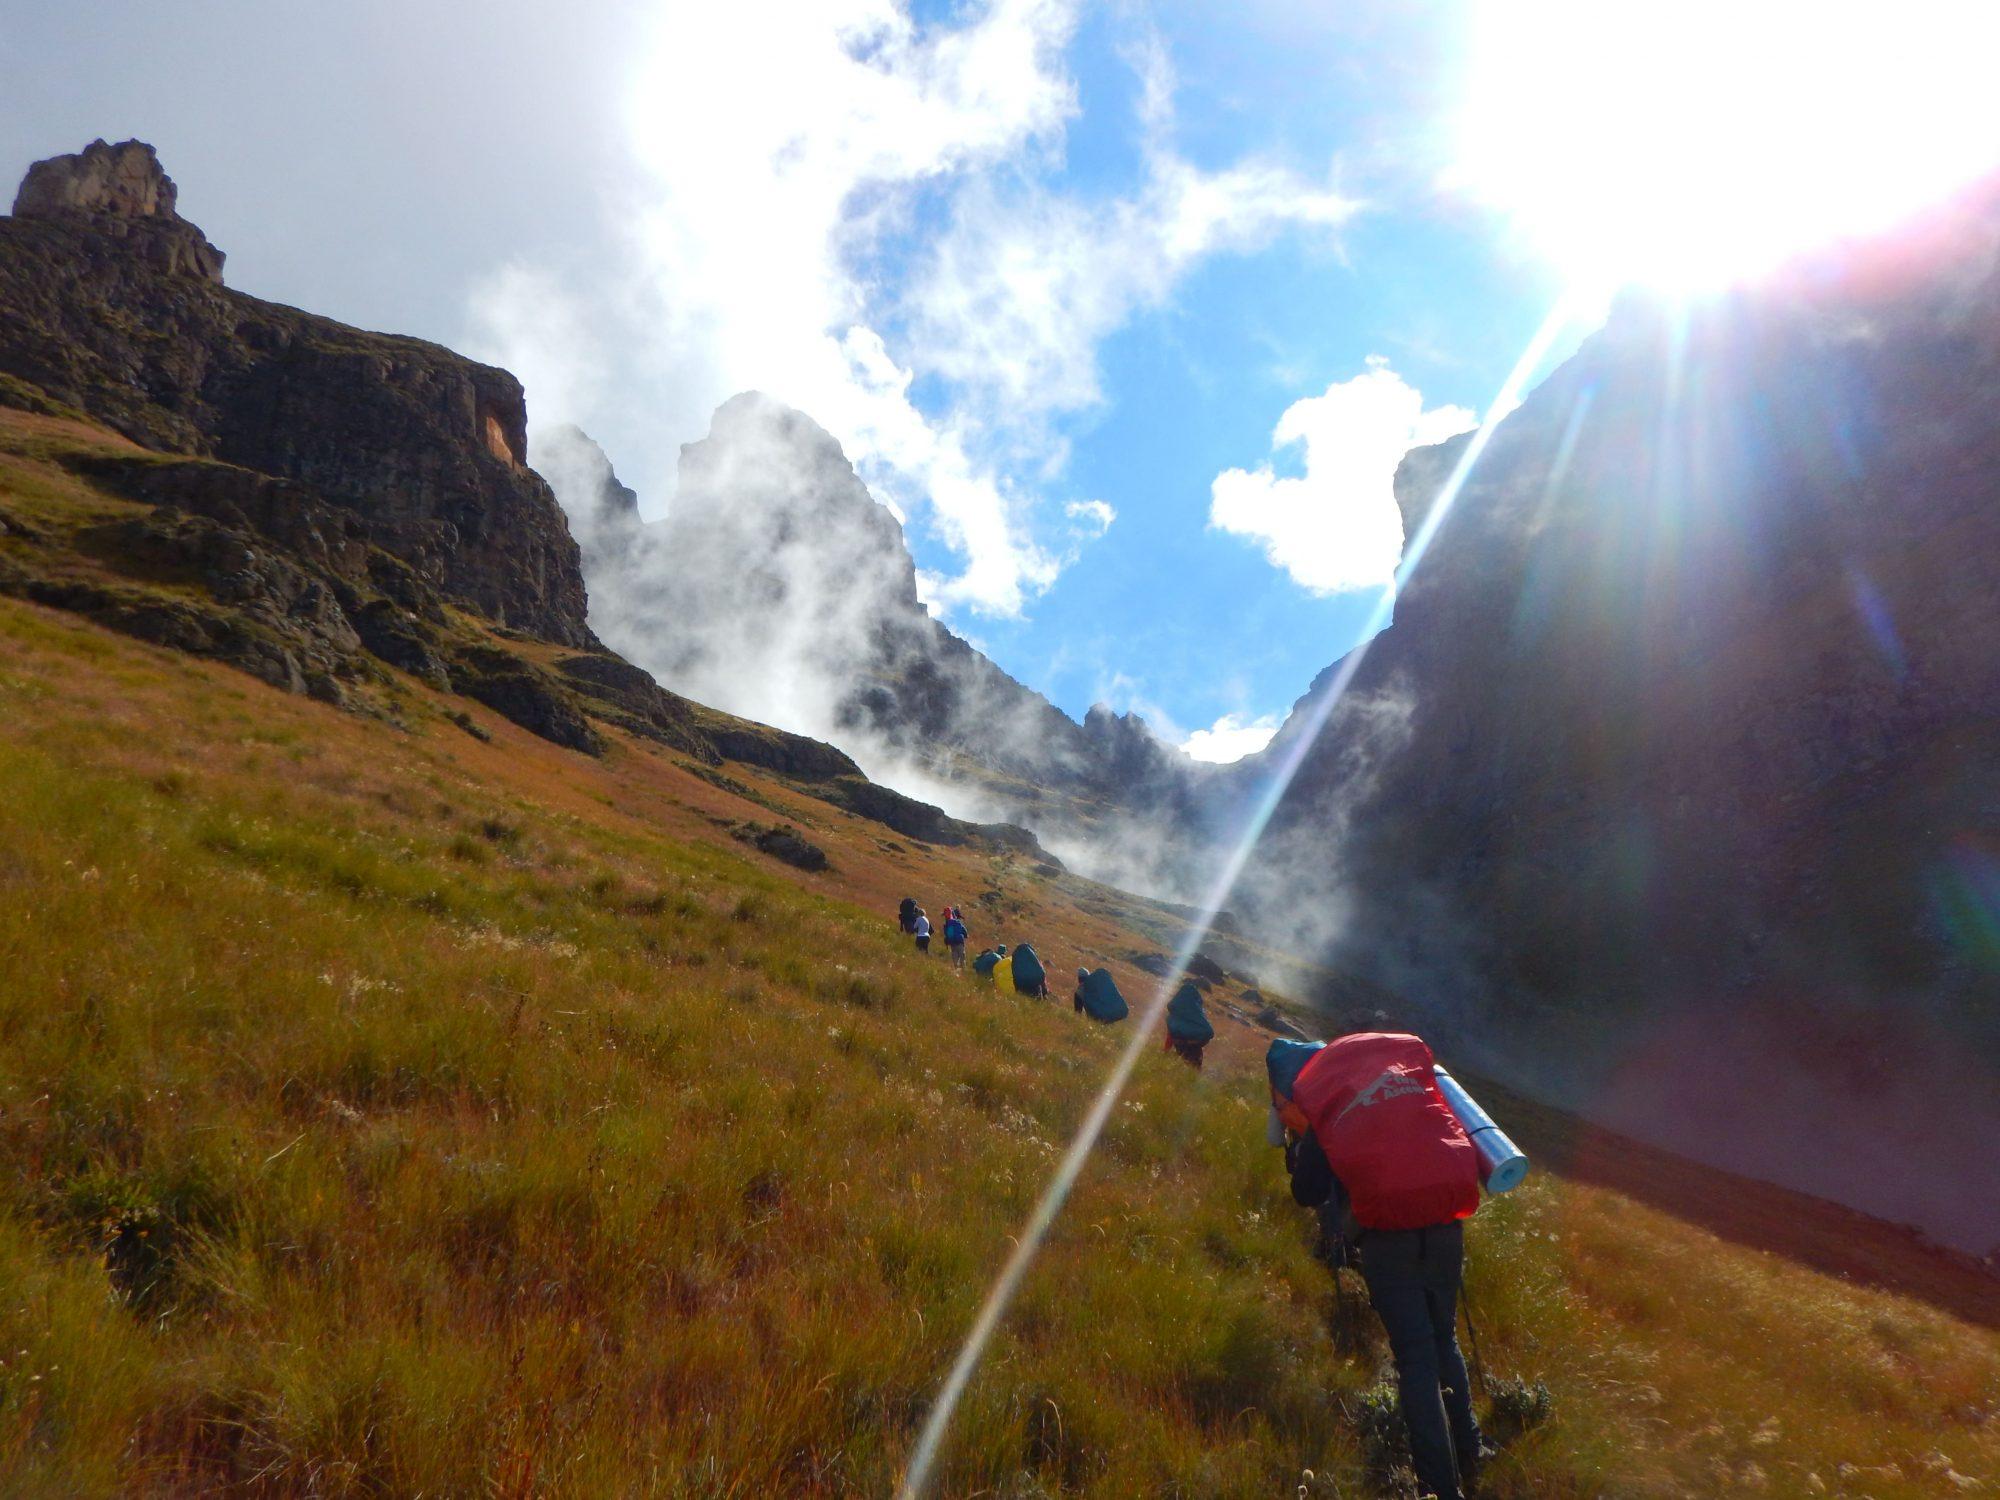 Berg Adventures, Drakensberg, KwaZulu-Natal